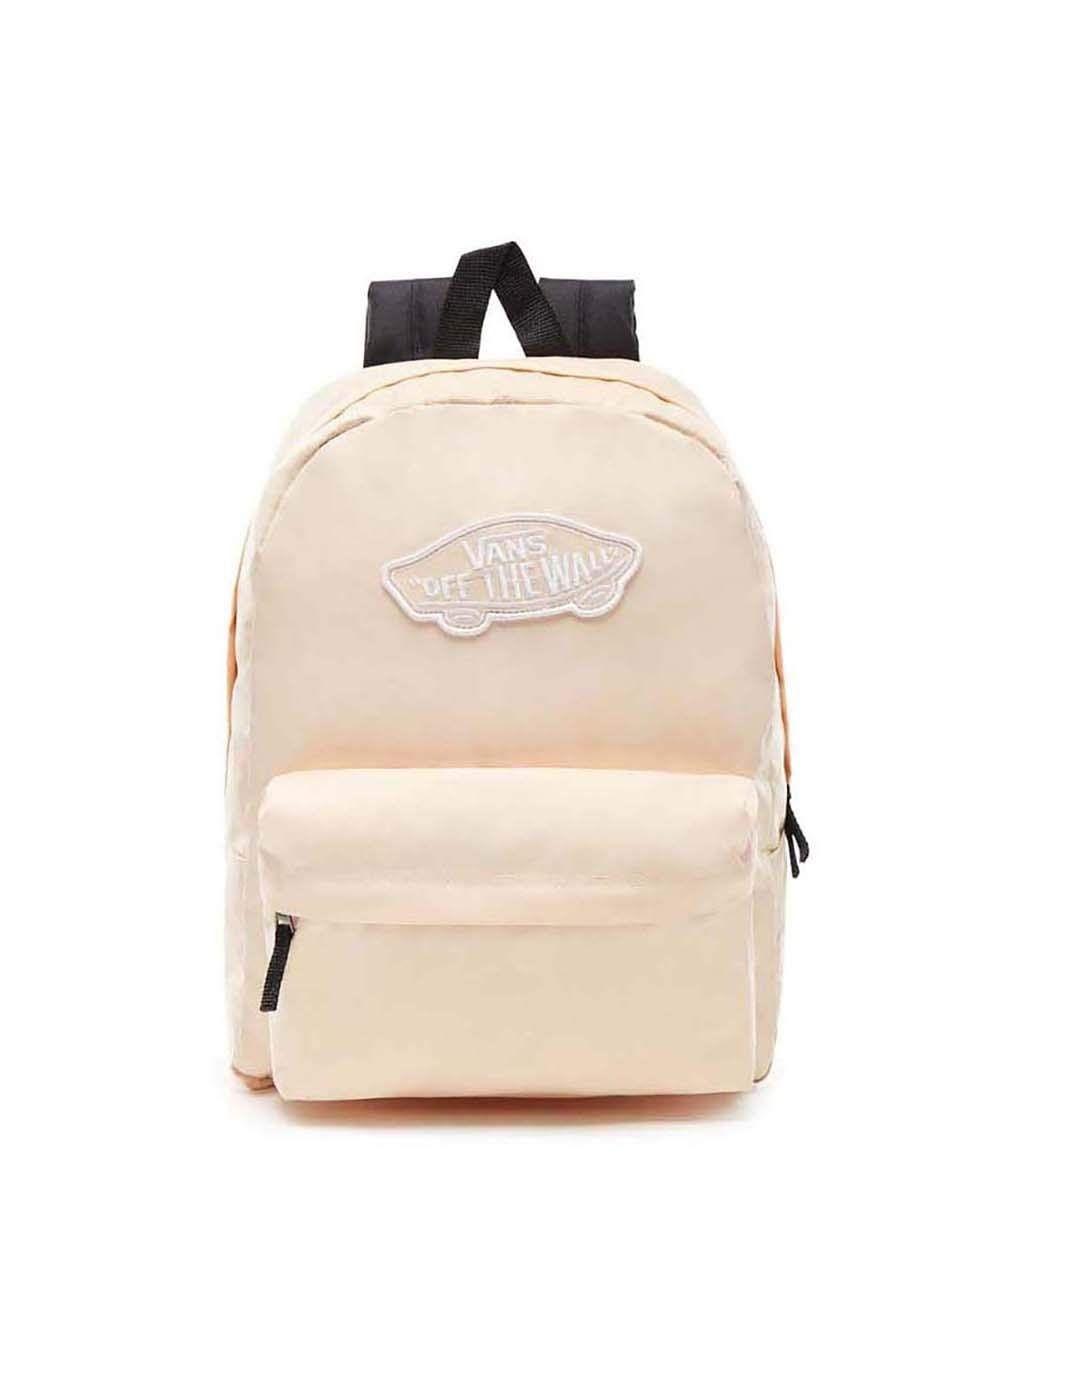 2403338776a5e Vans Realm Backpack Mochila Tipo Casual